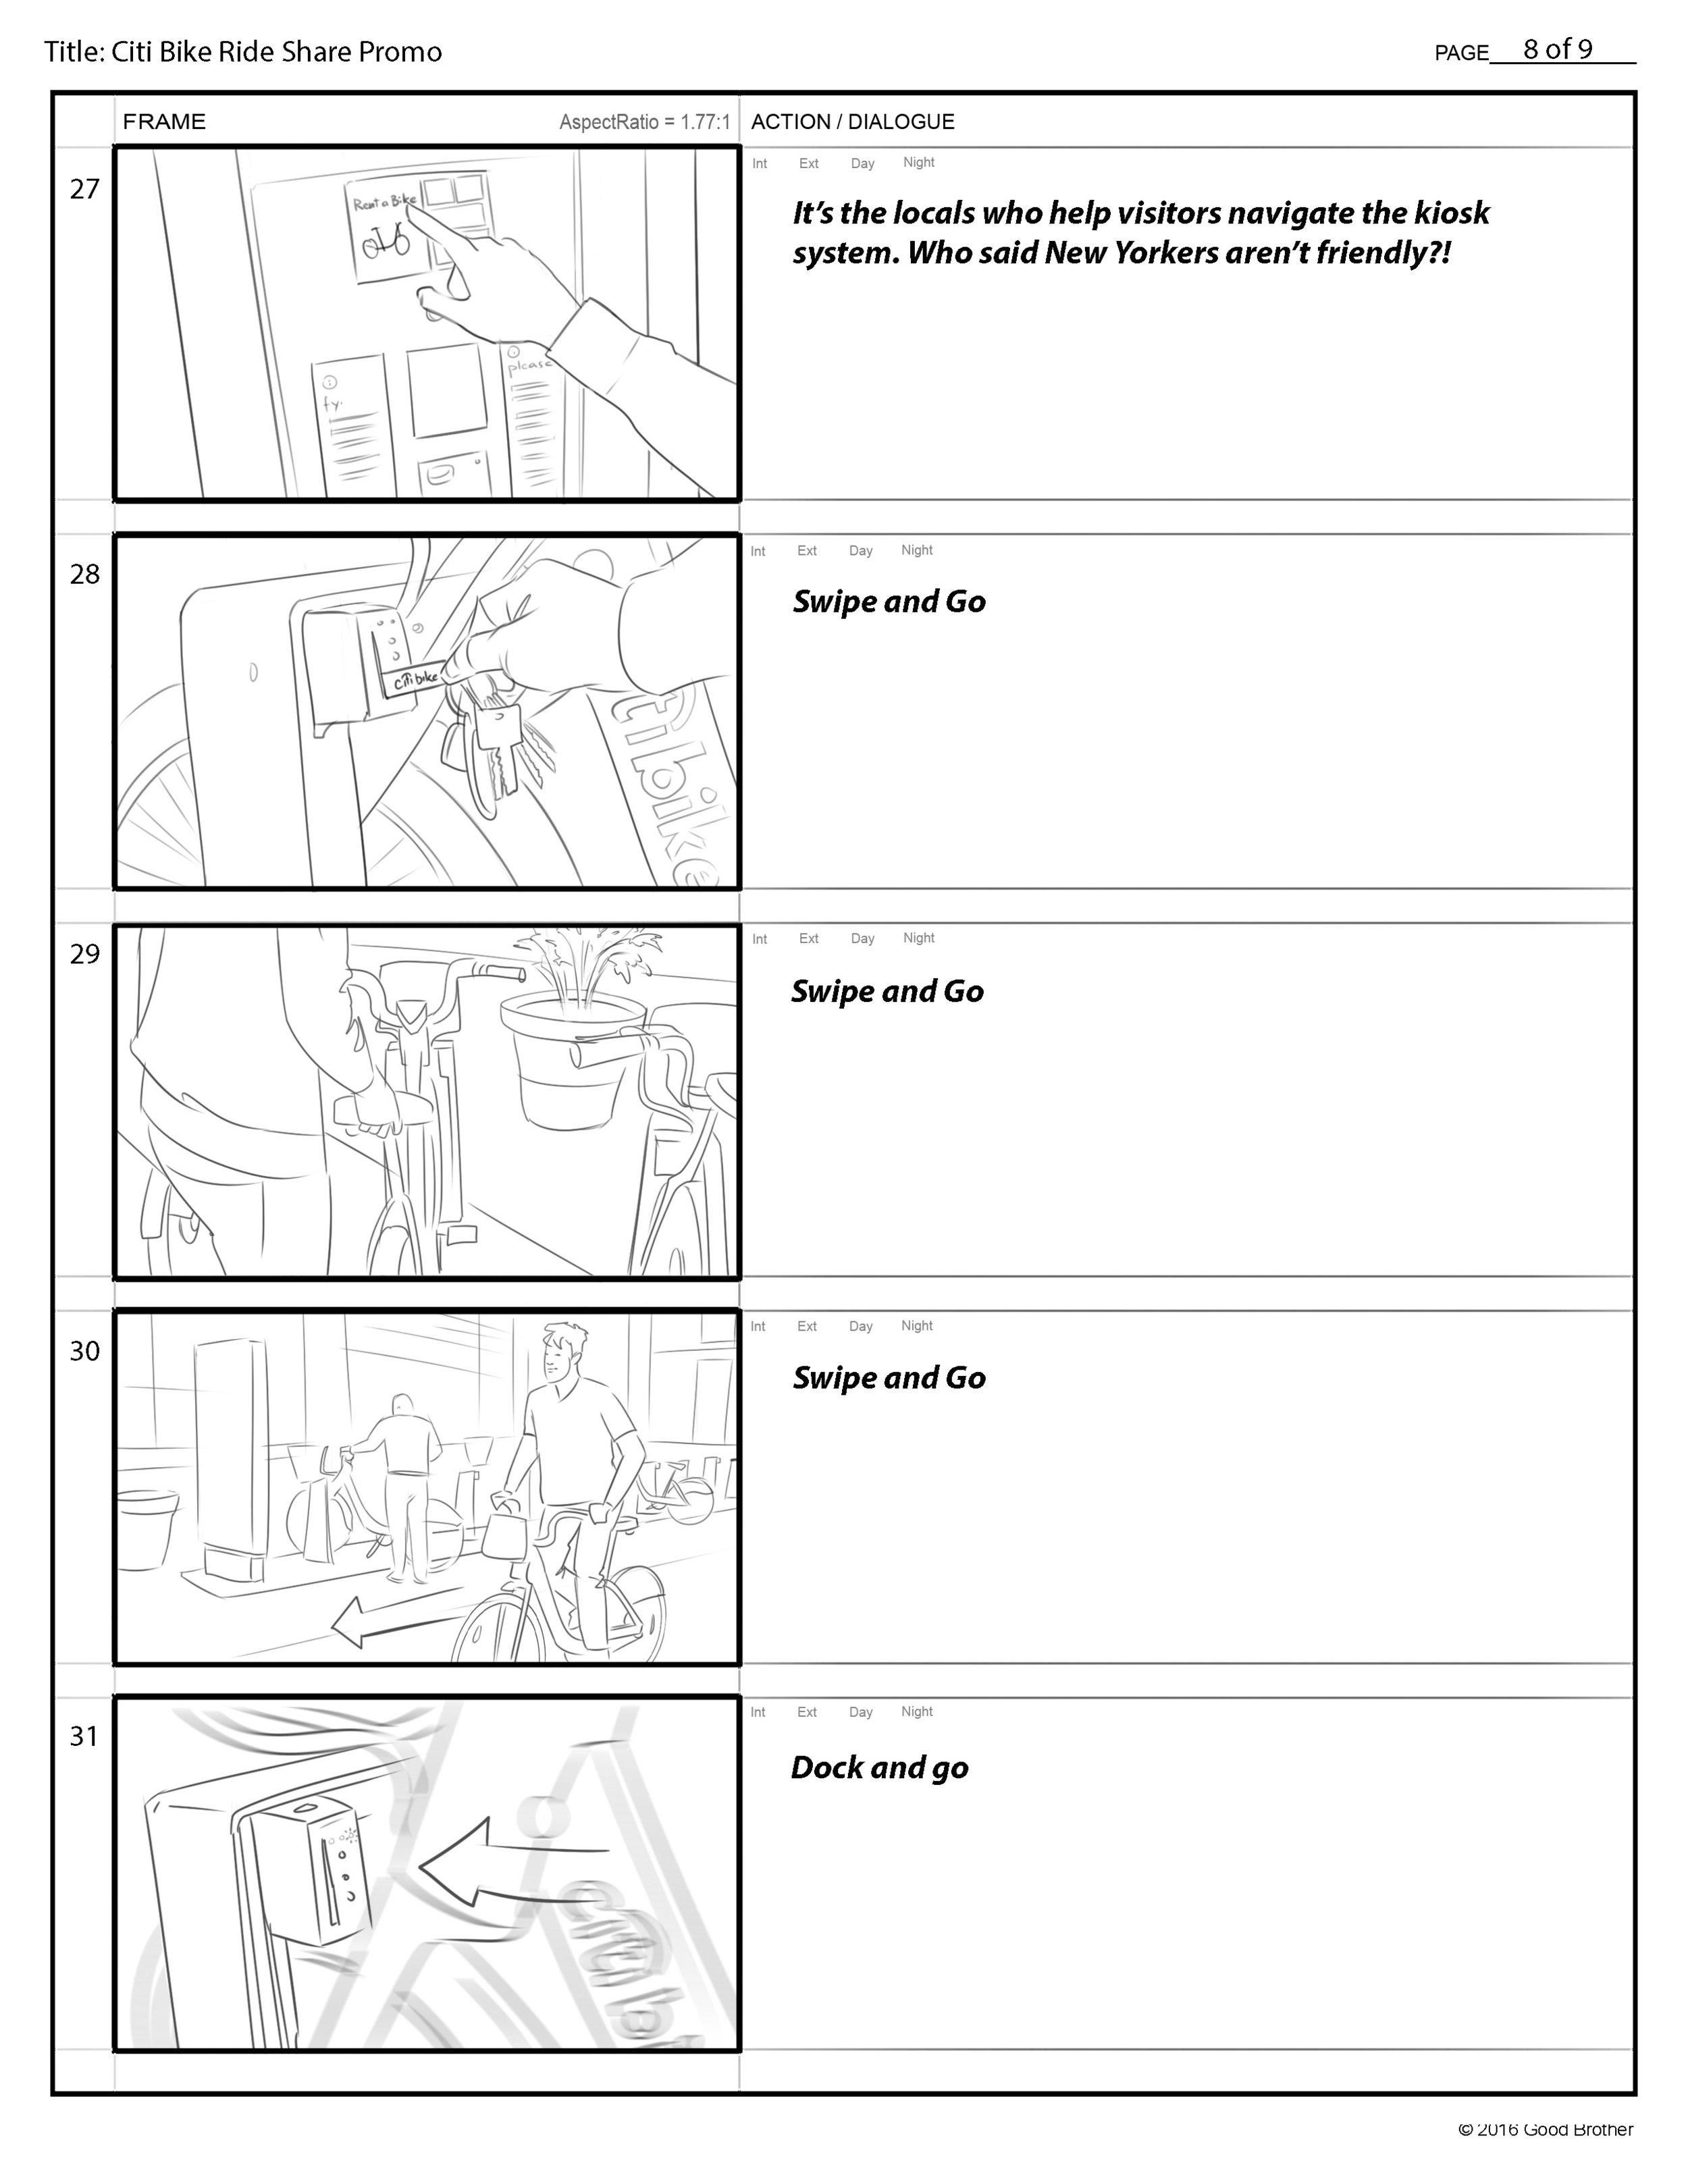 Citi Bike Storyboard FINAL_Page_8.jpg